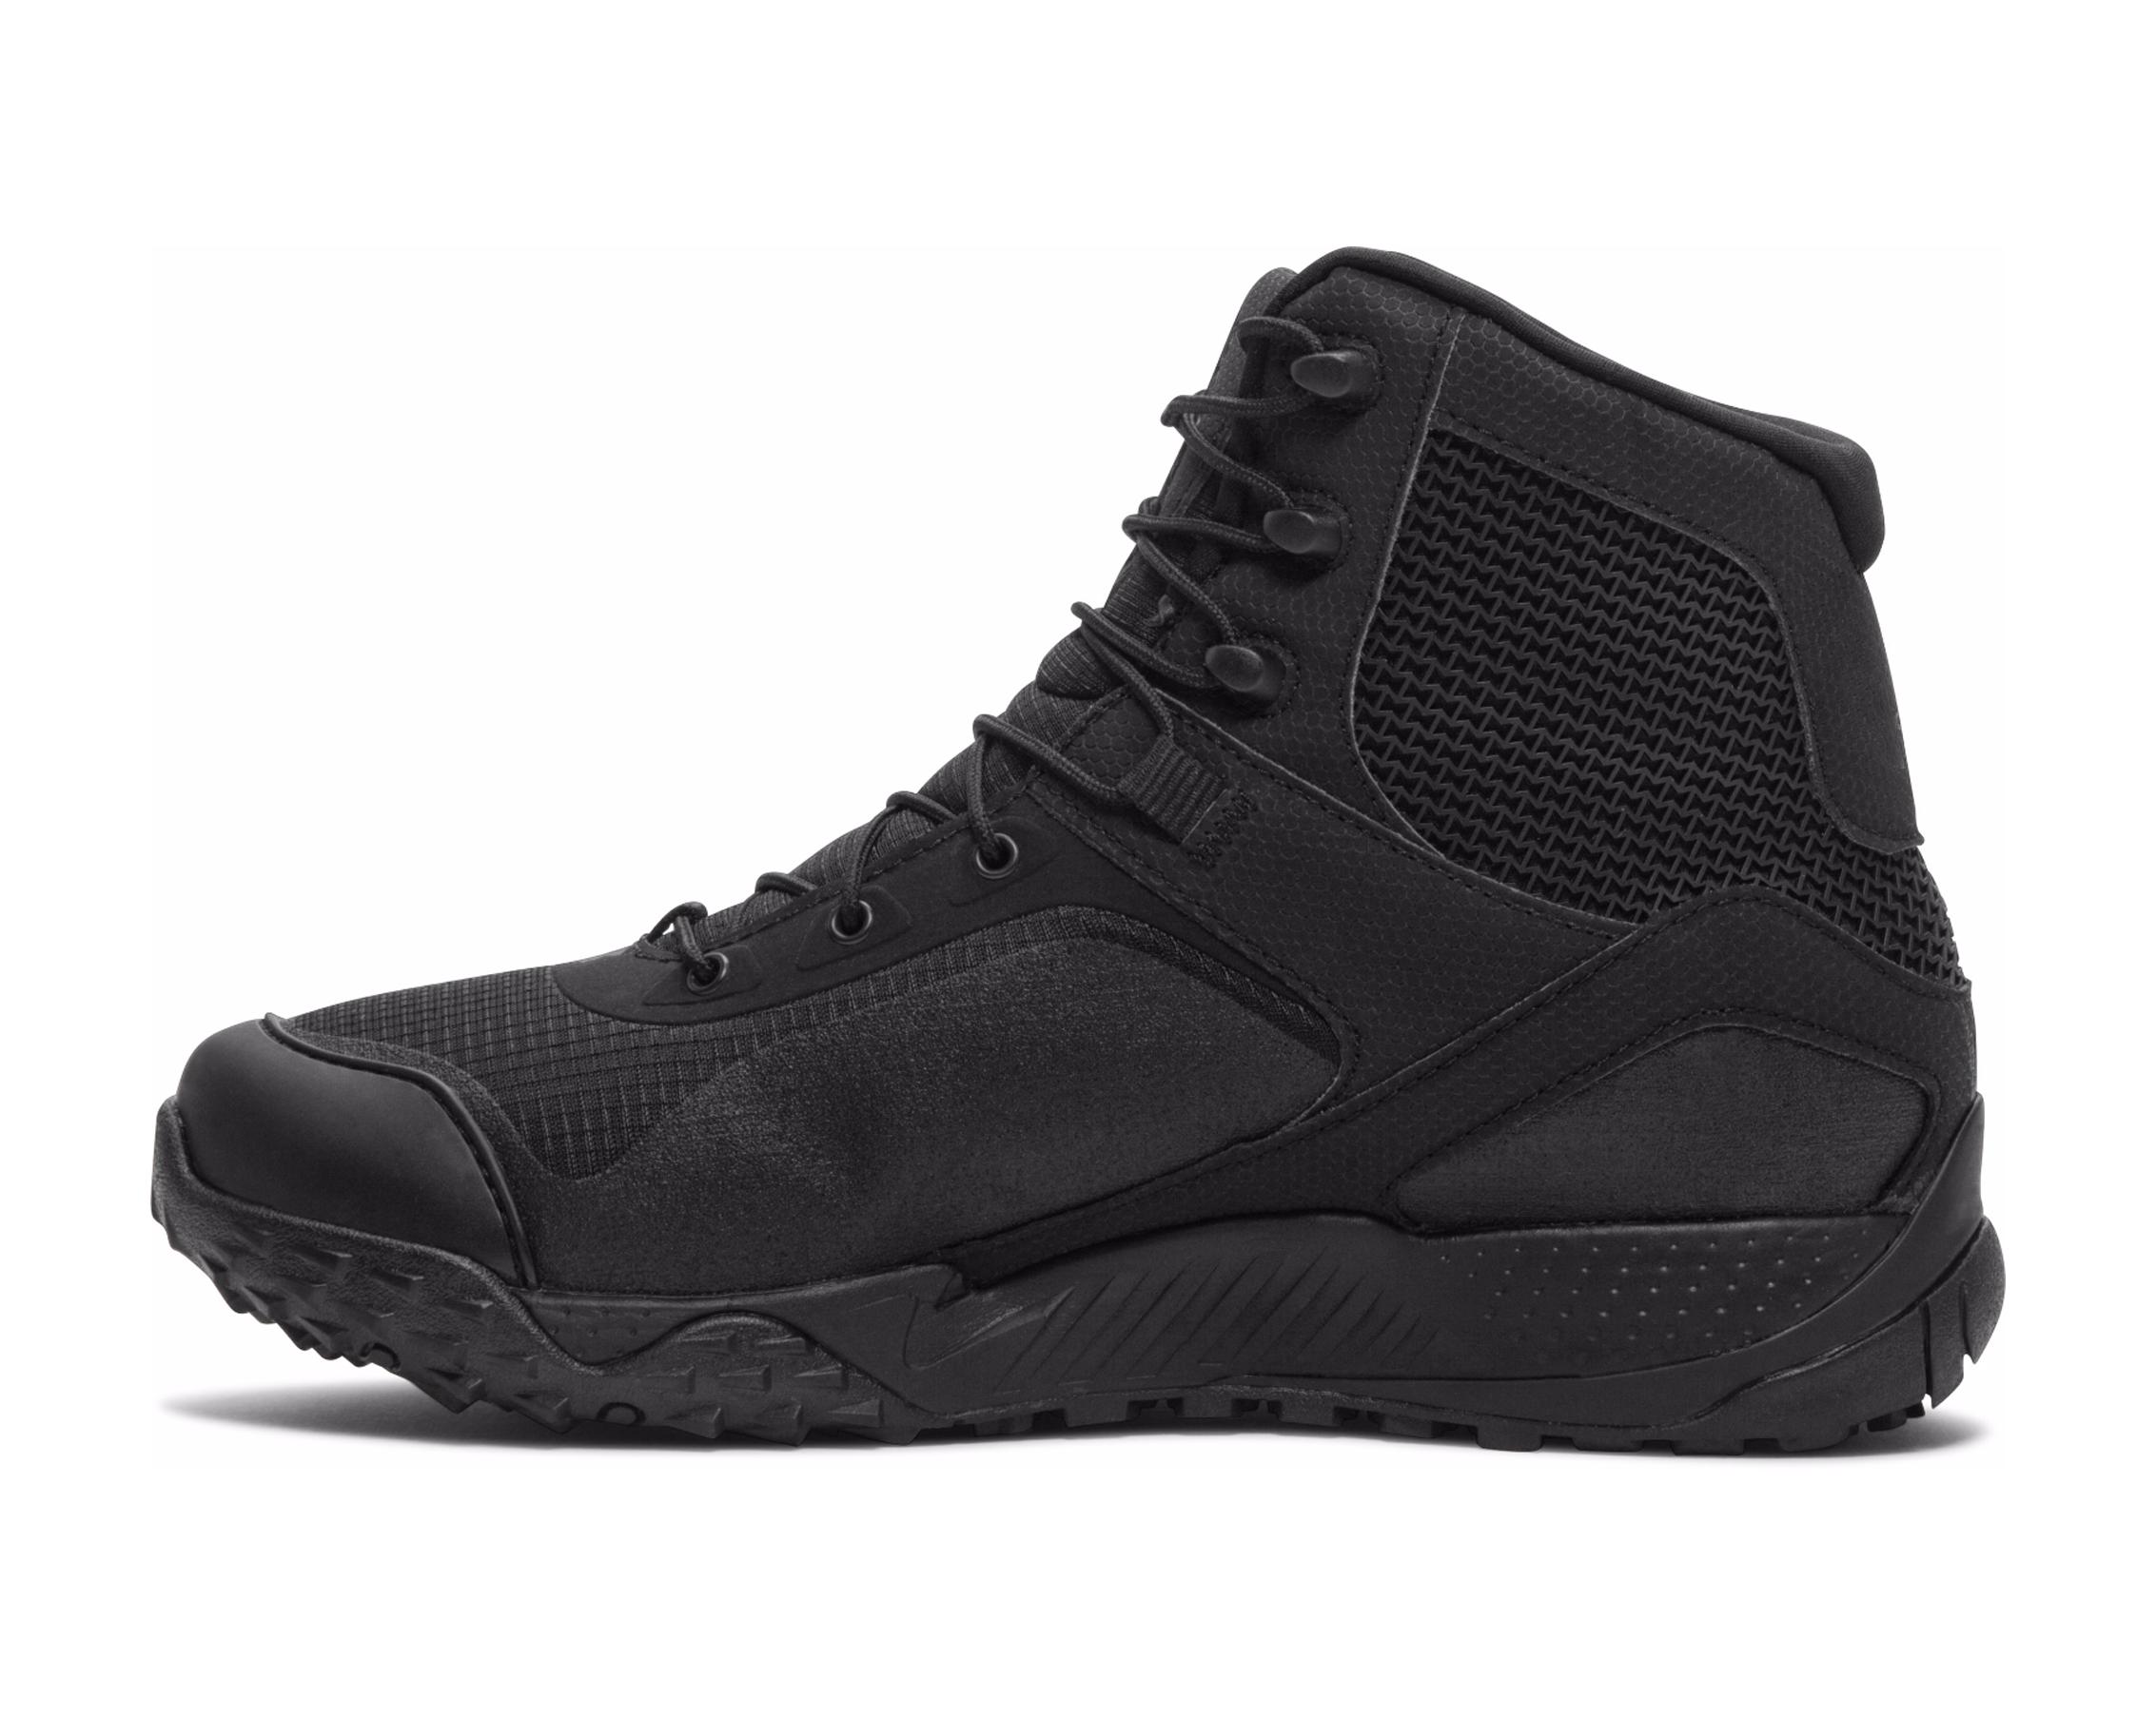 Under Armour 1250234 Mens Ua Valsetz Rts Tactical Boots